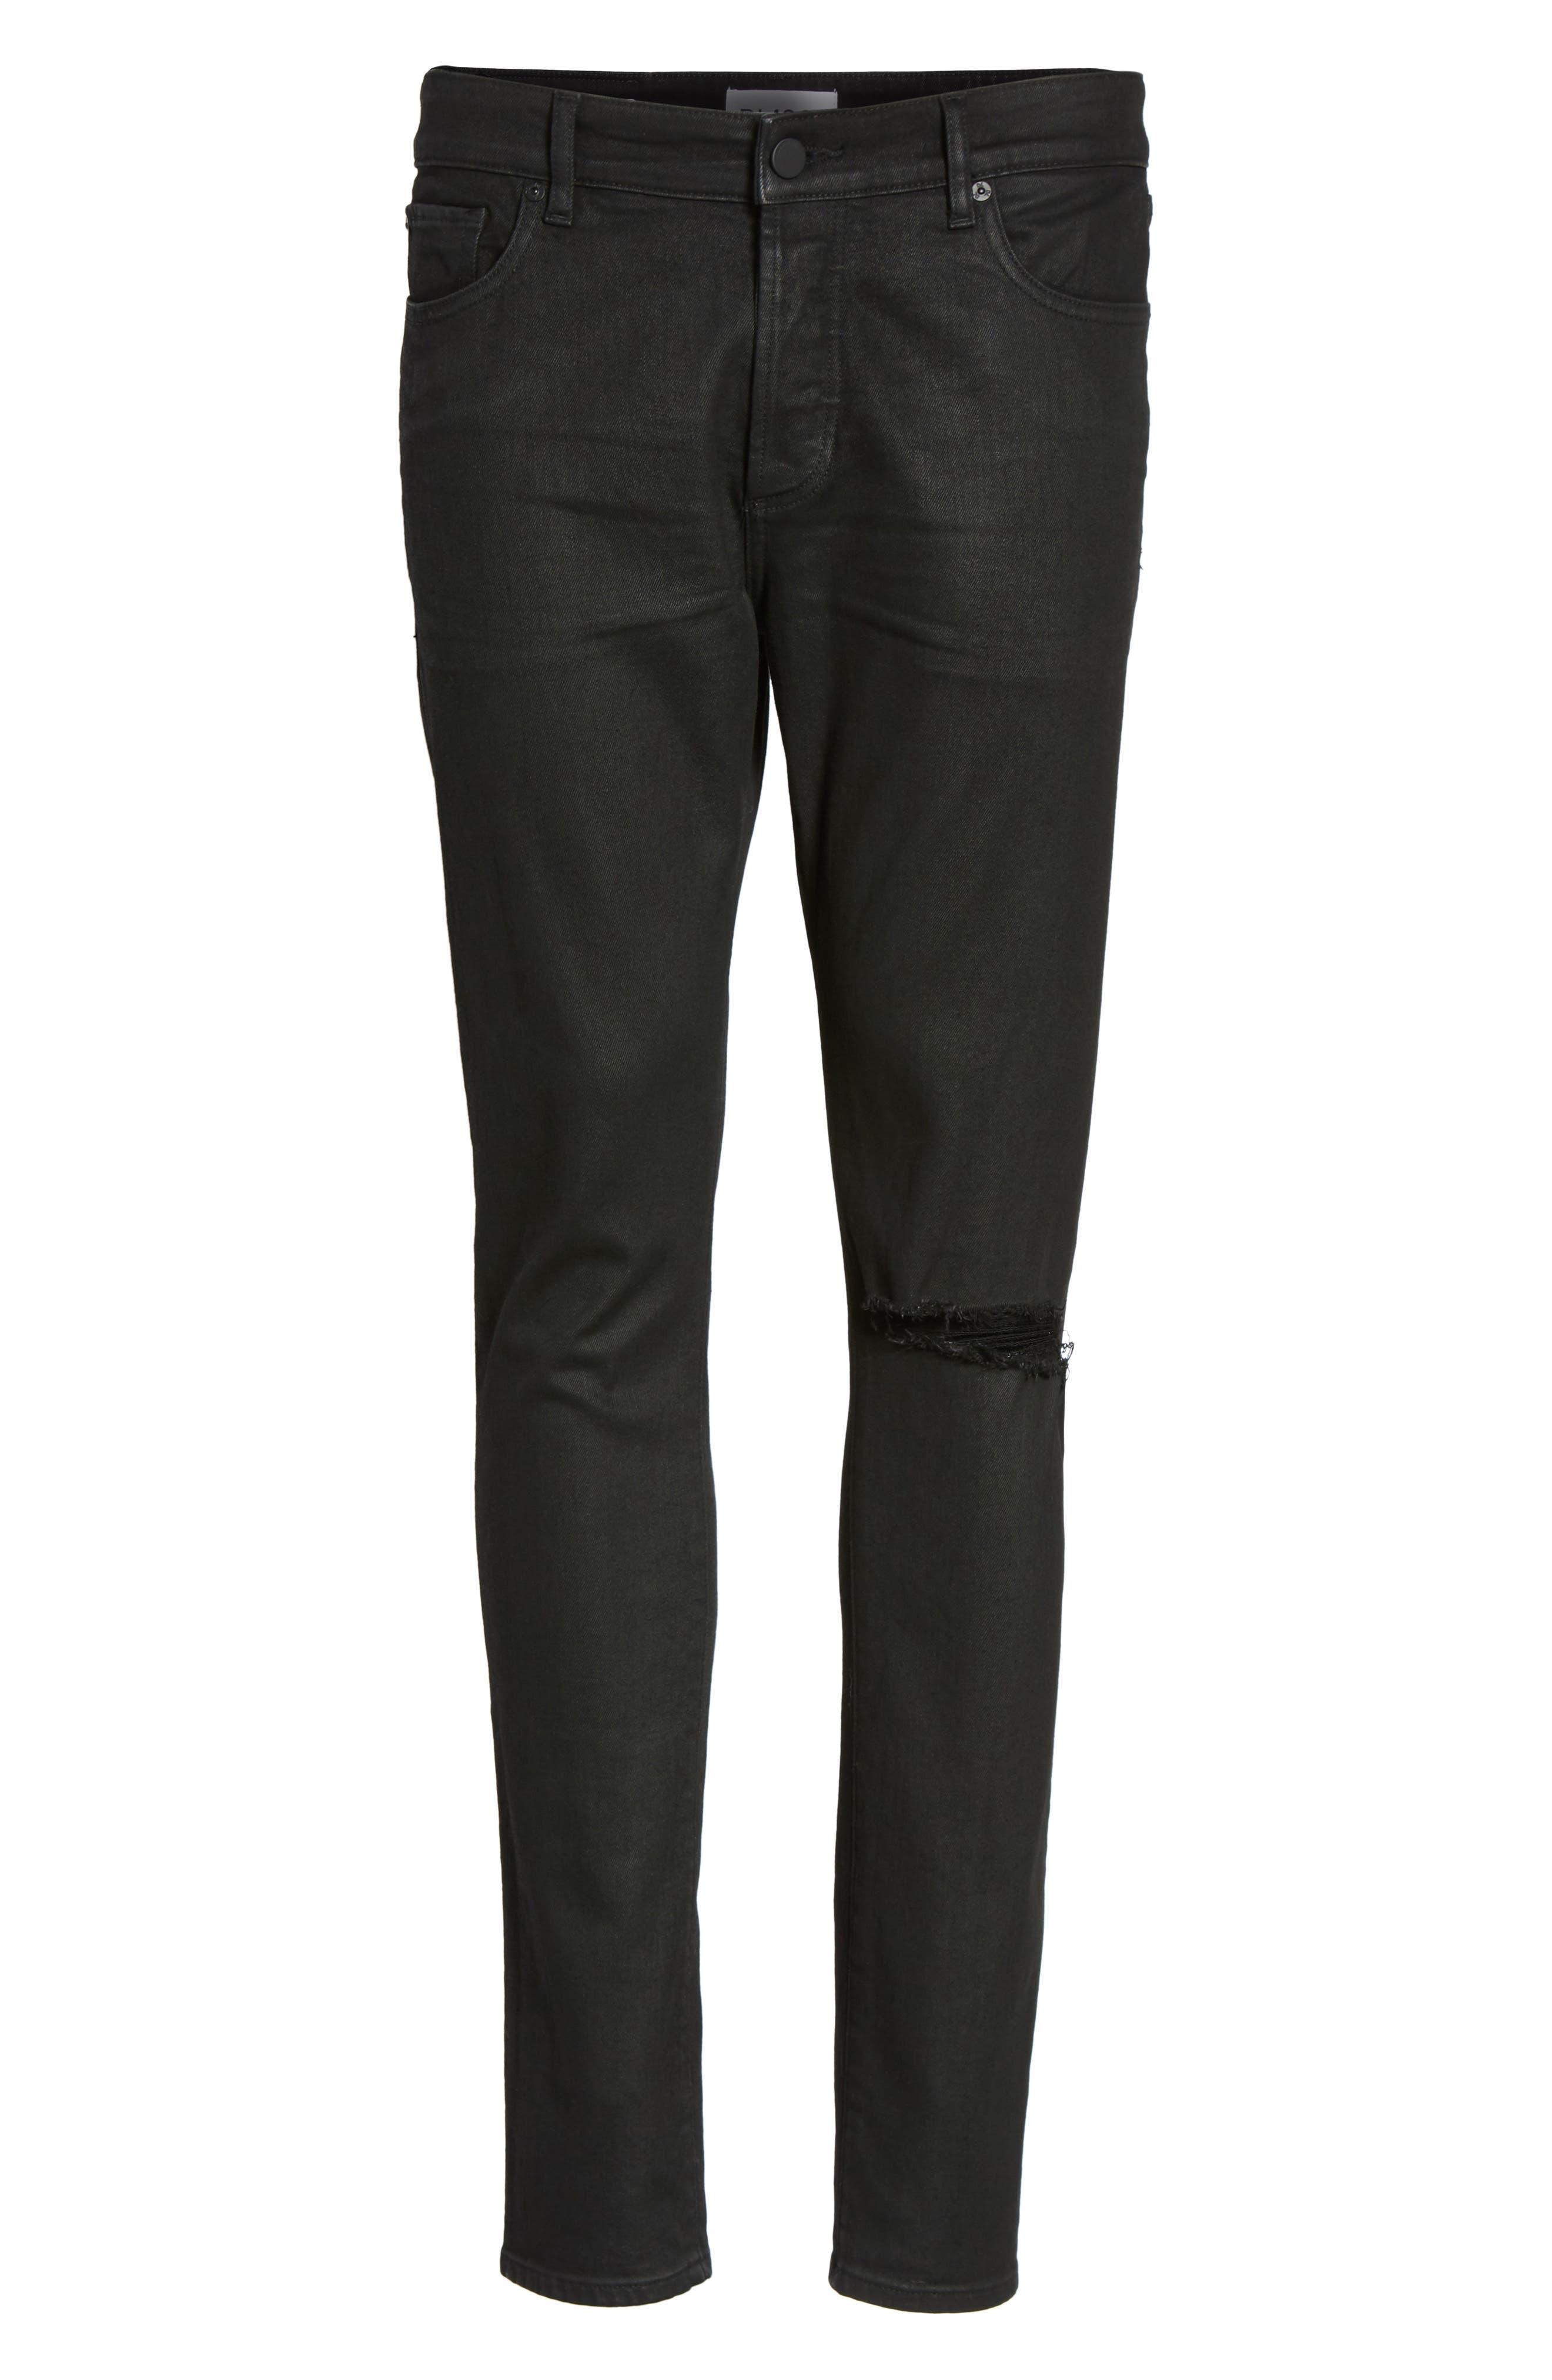 Hunter Skinny Jeans,                             Alternate thumbnail 6, color,                             VICE